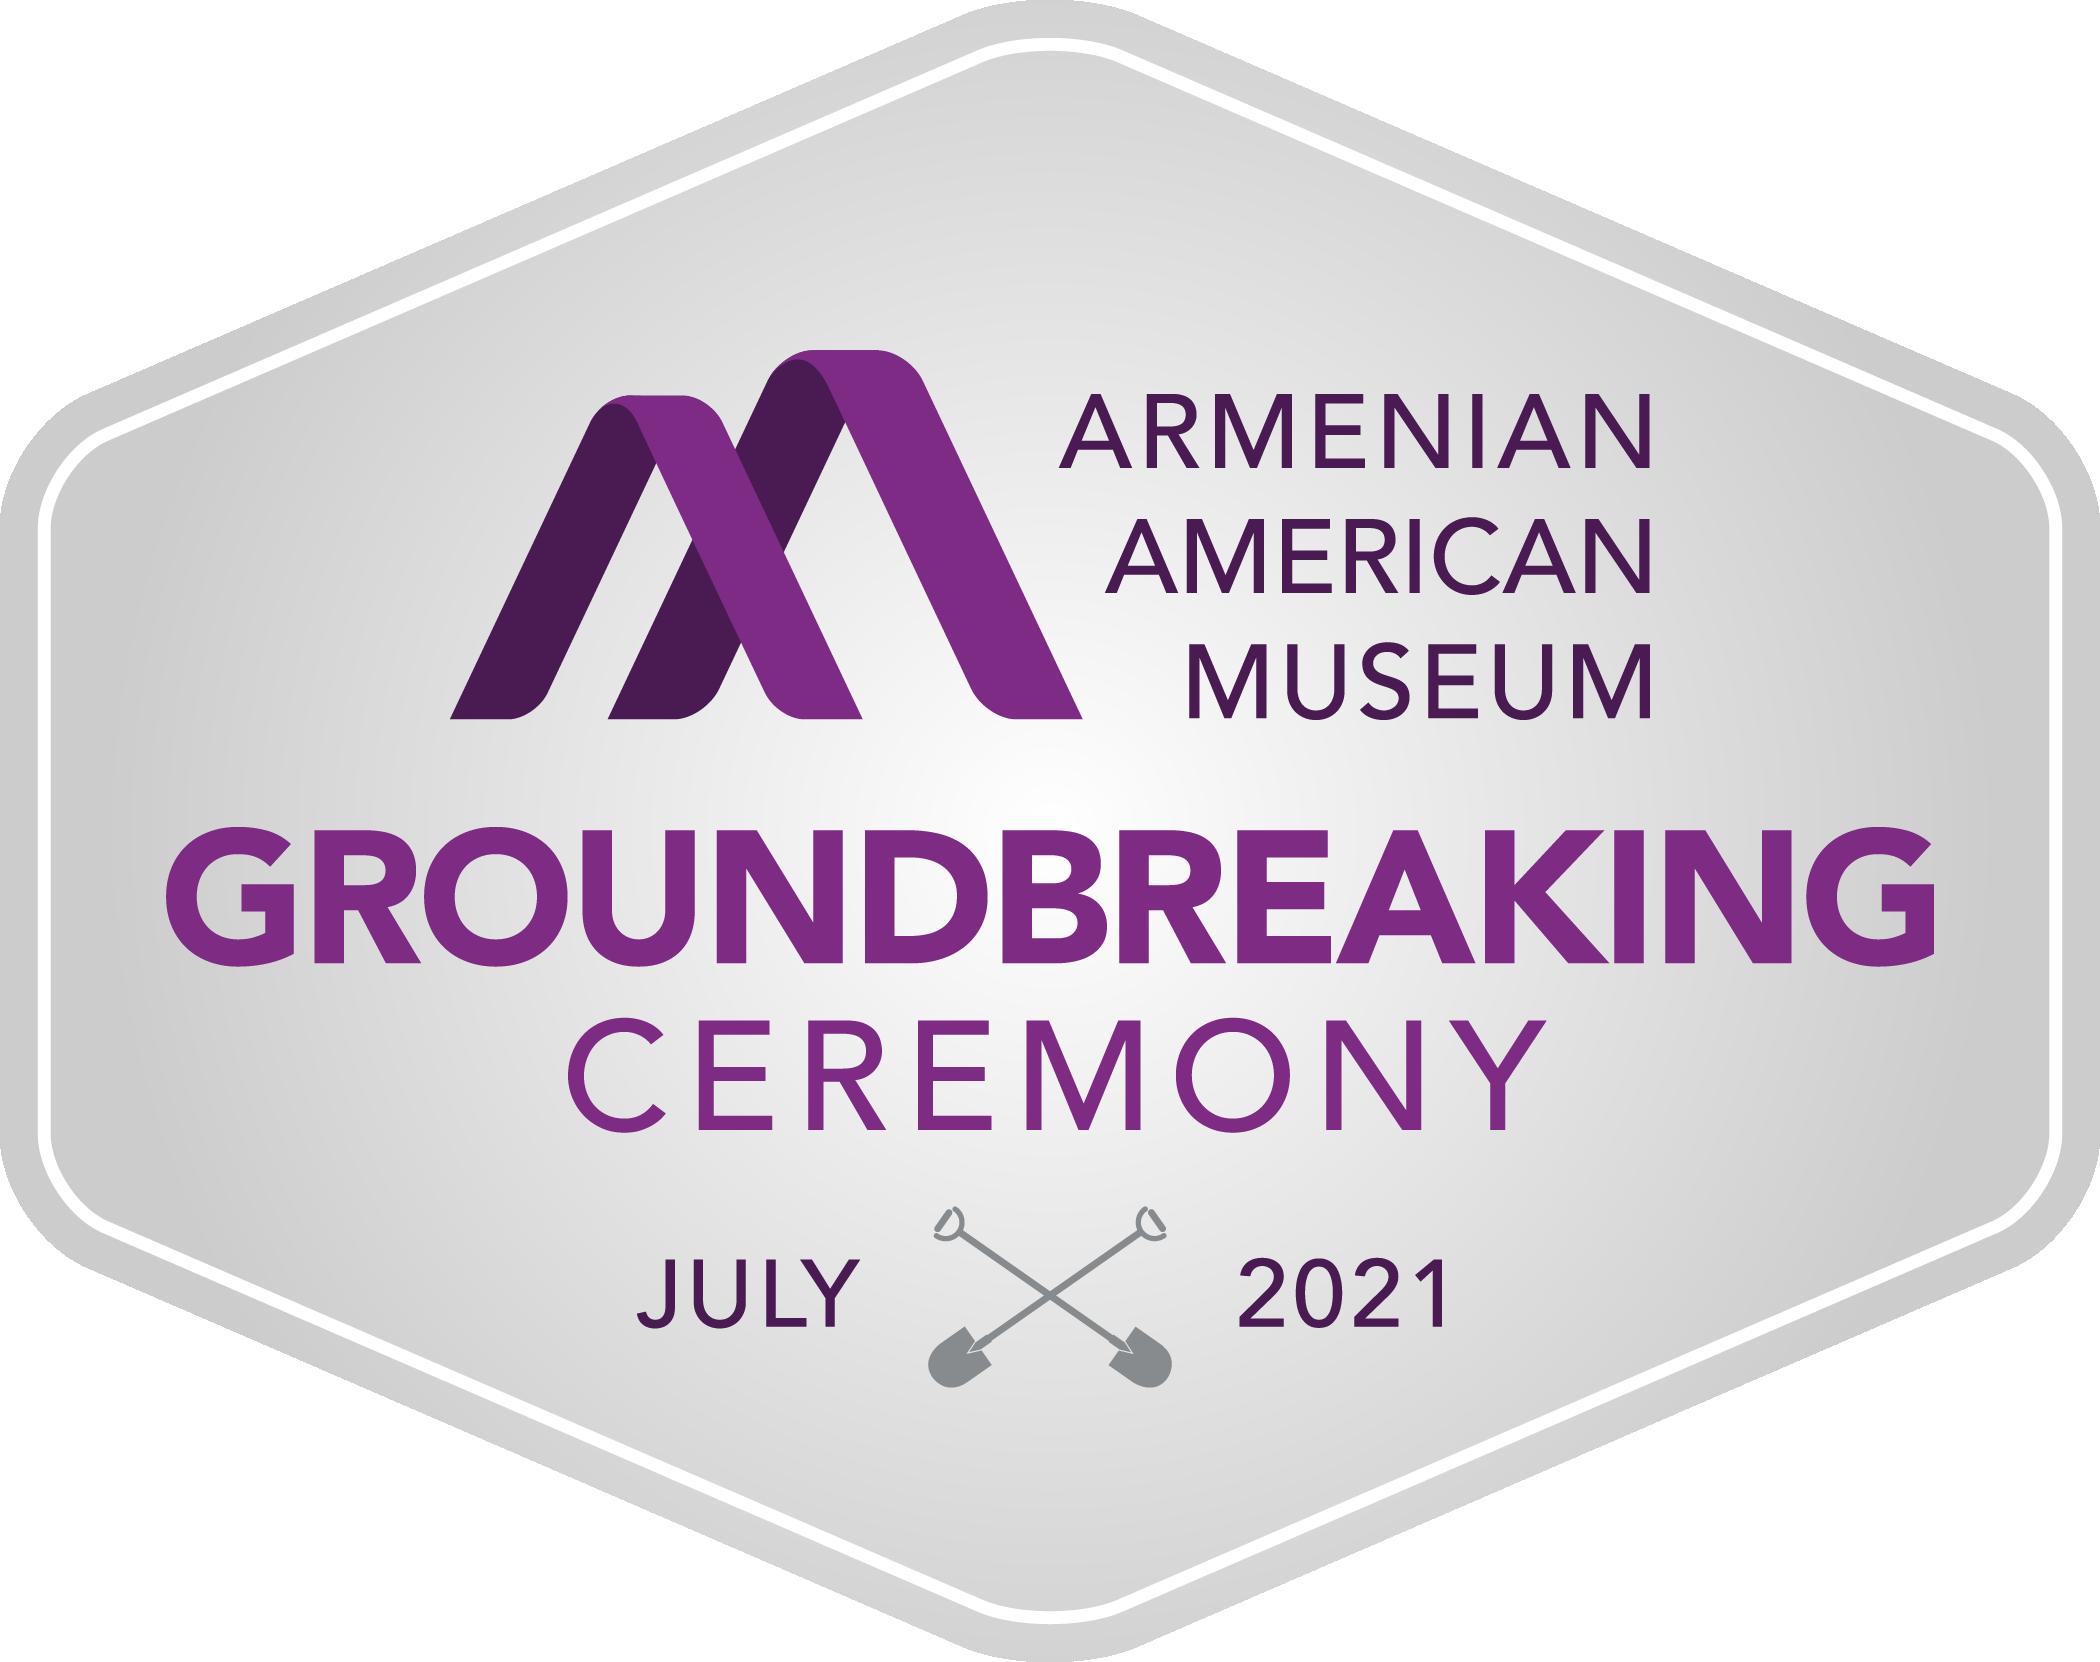 AAMCCC Groundbreaking Ceremony Logo Gray